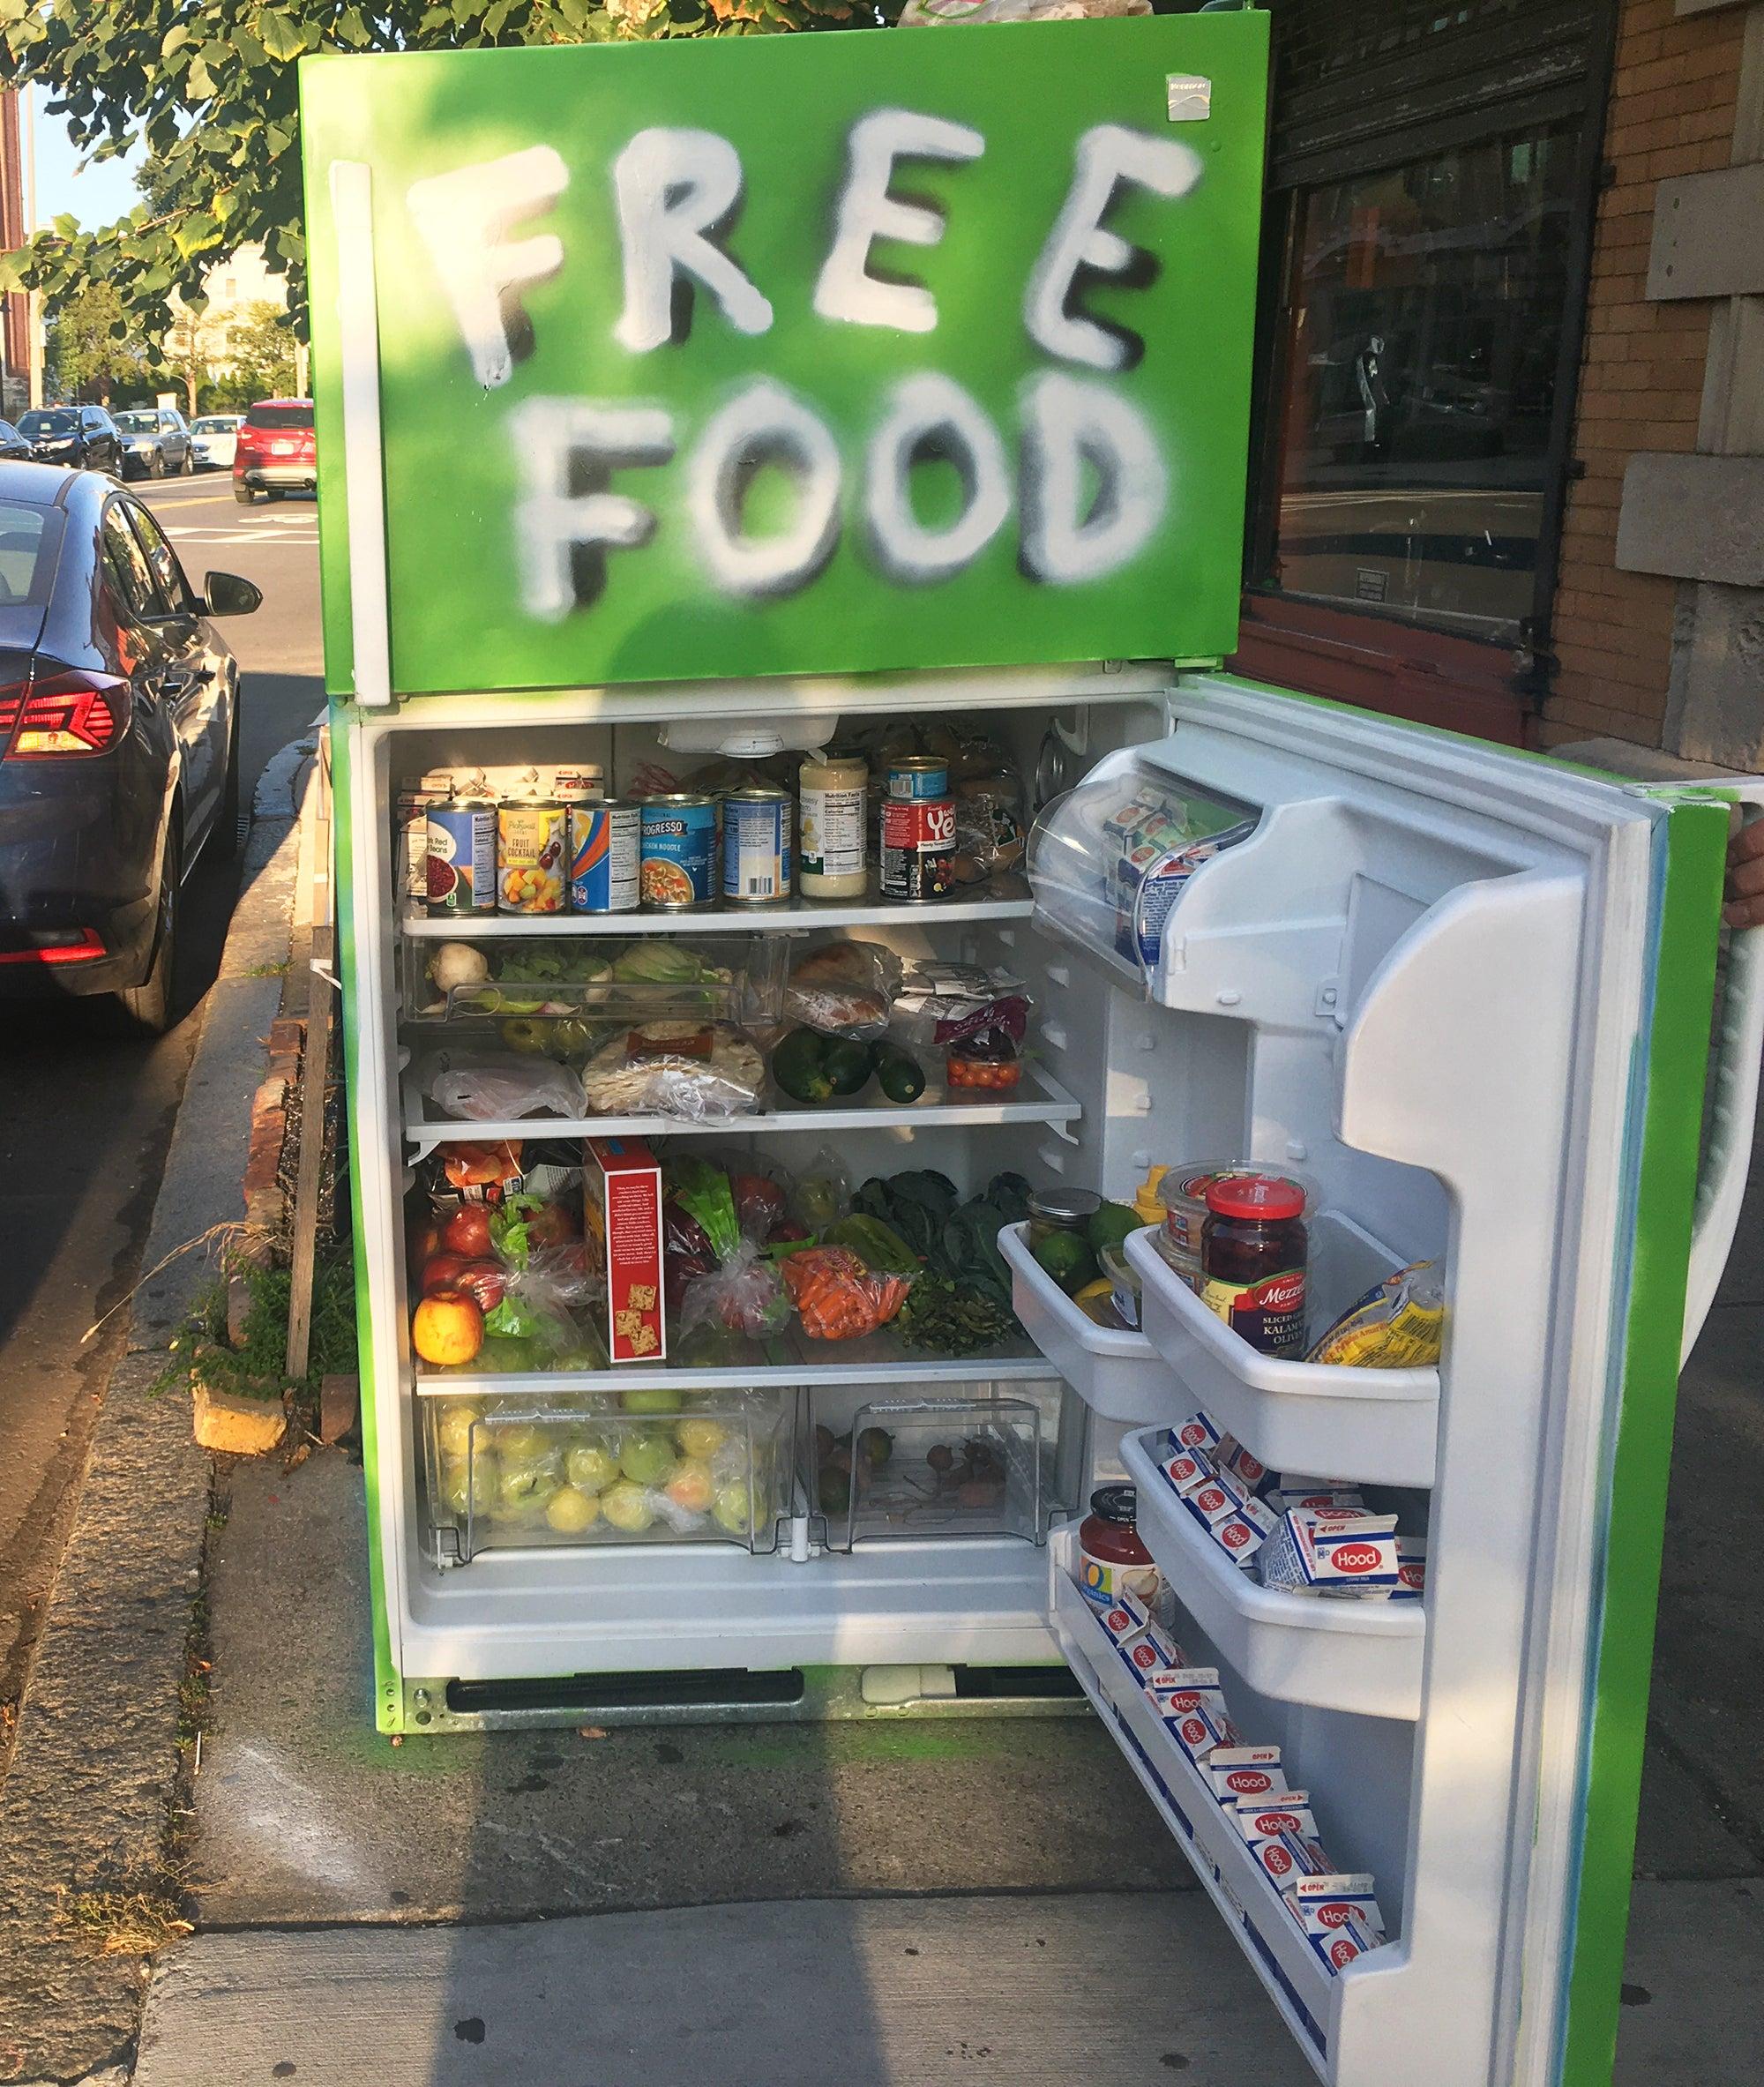 Jamaica Plain community fridge